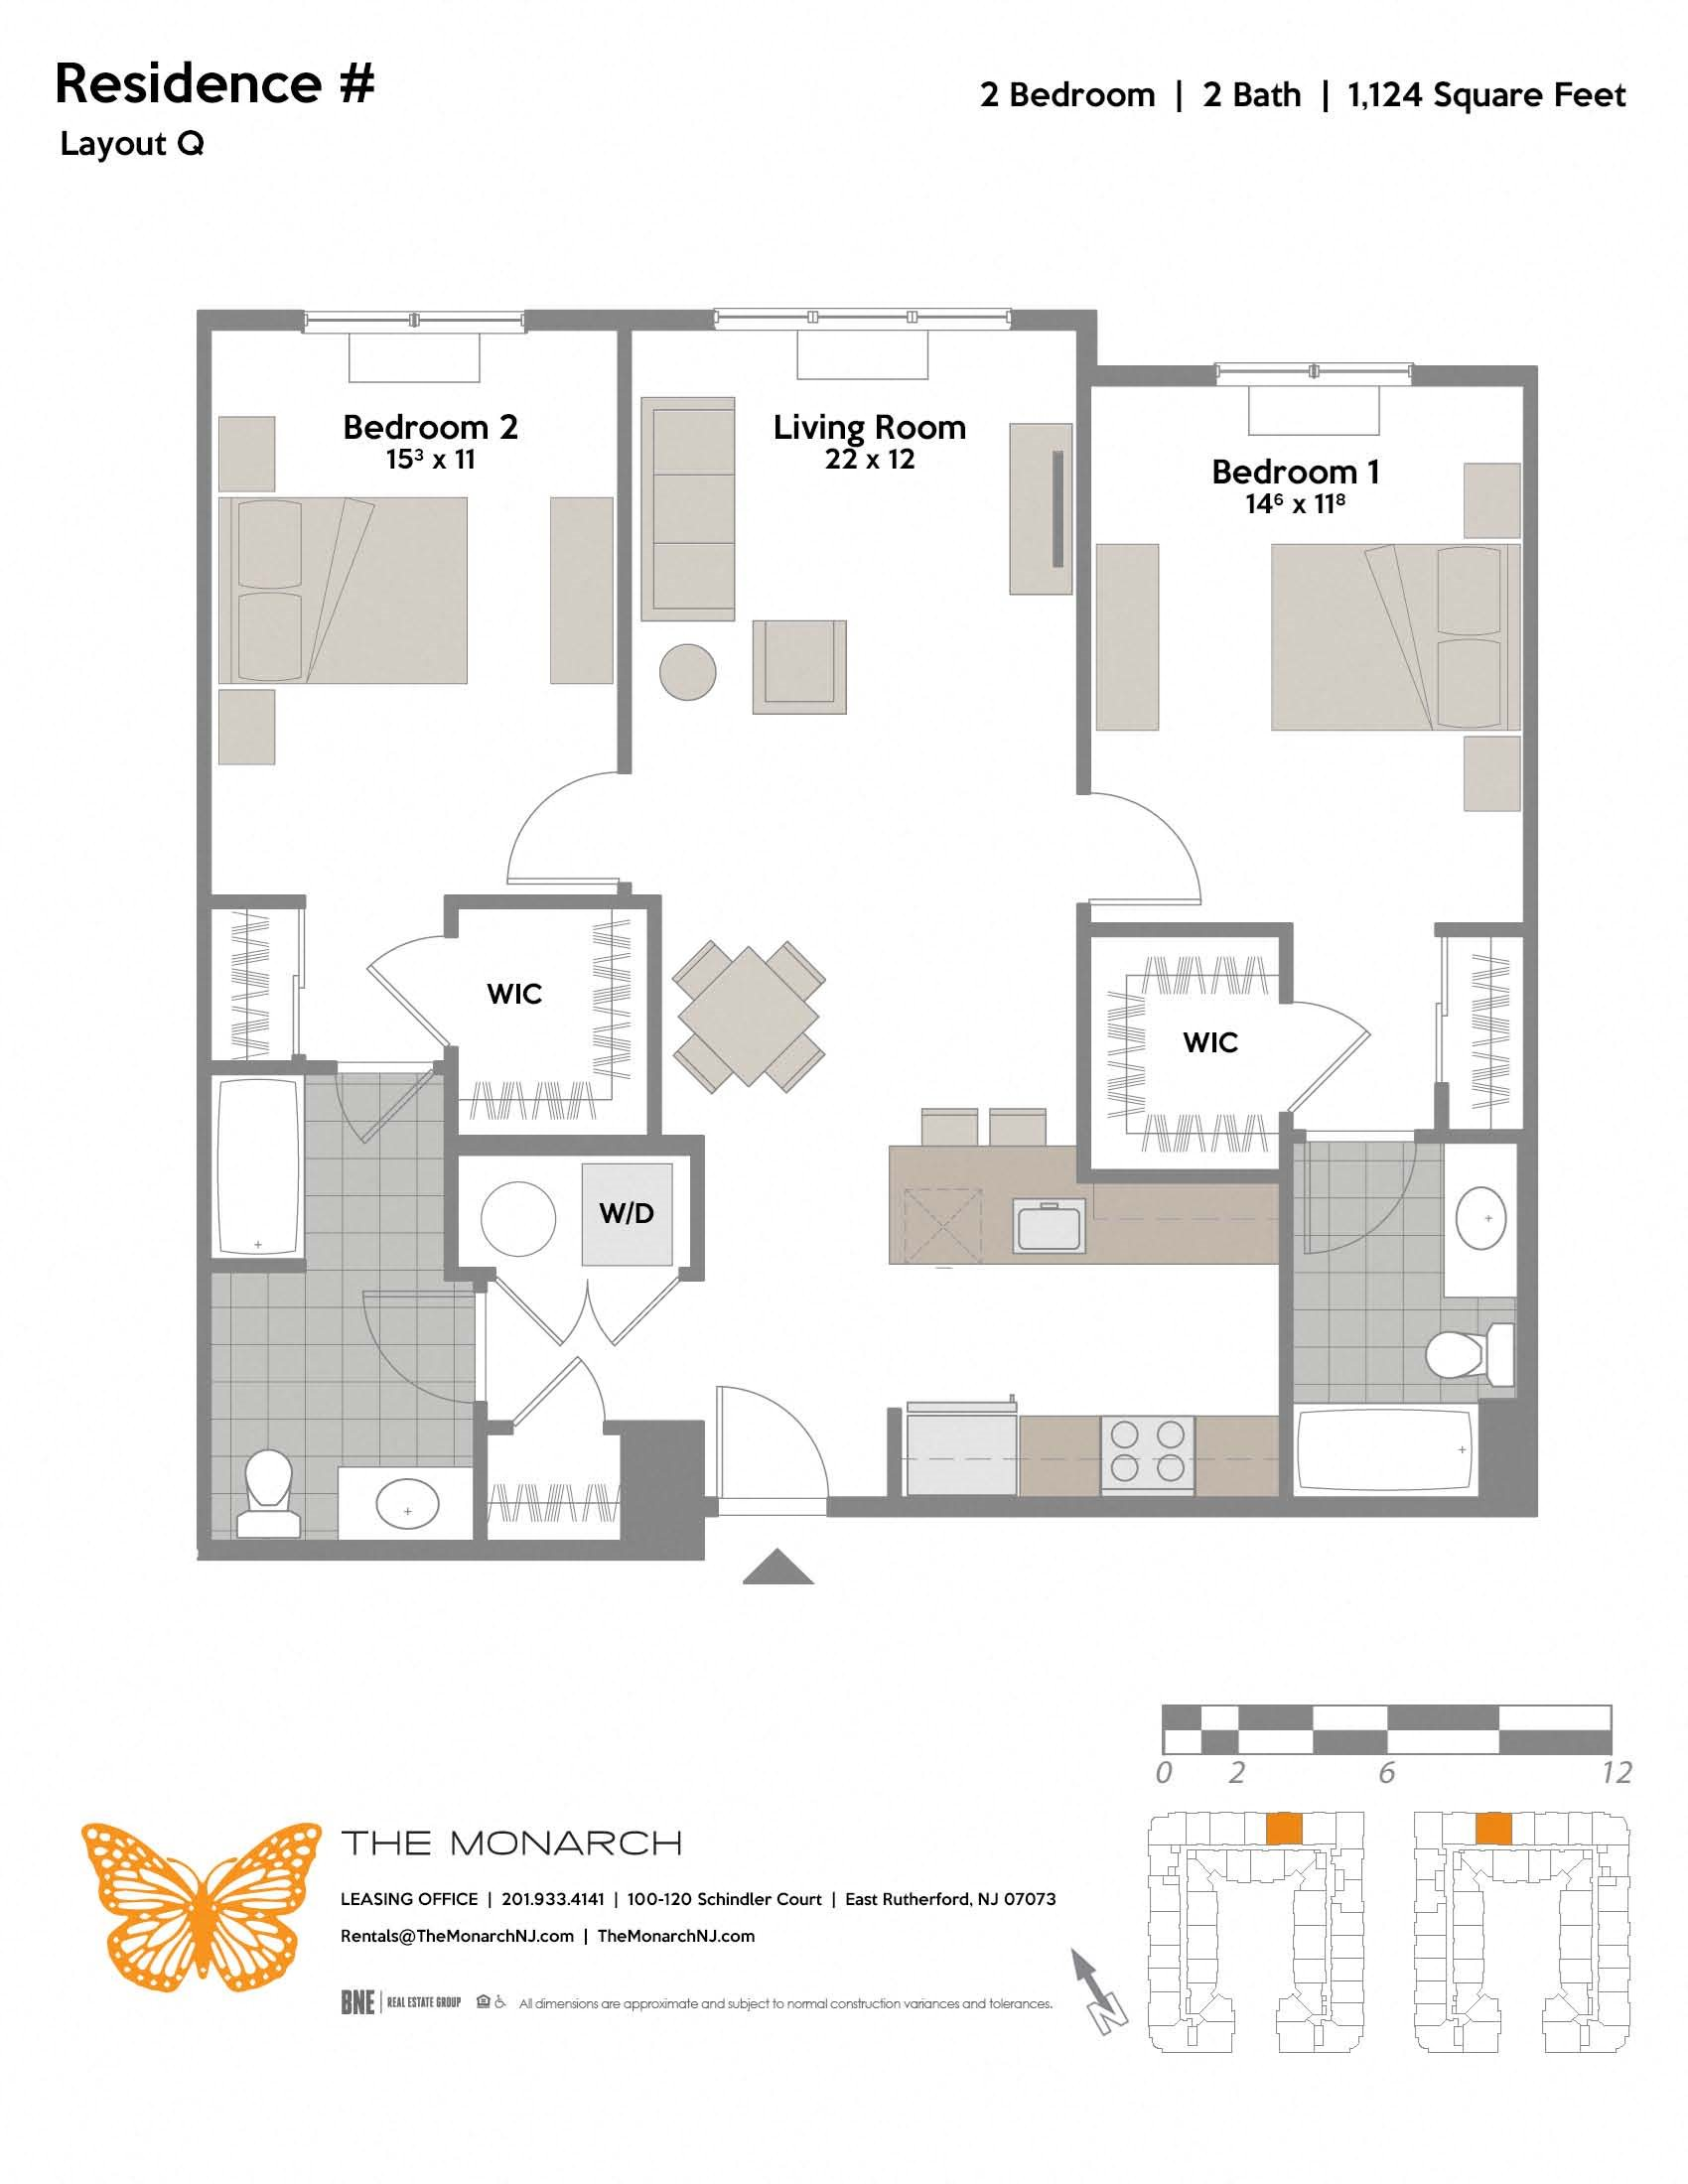 Layout Q Floor Plan 4